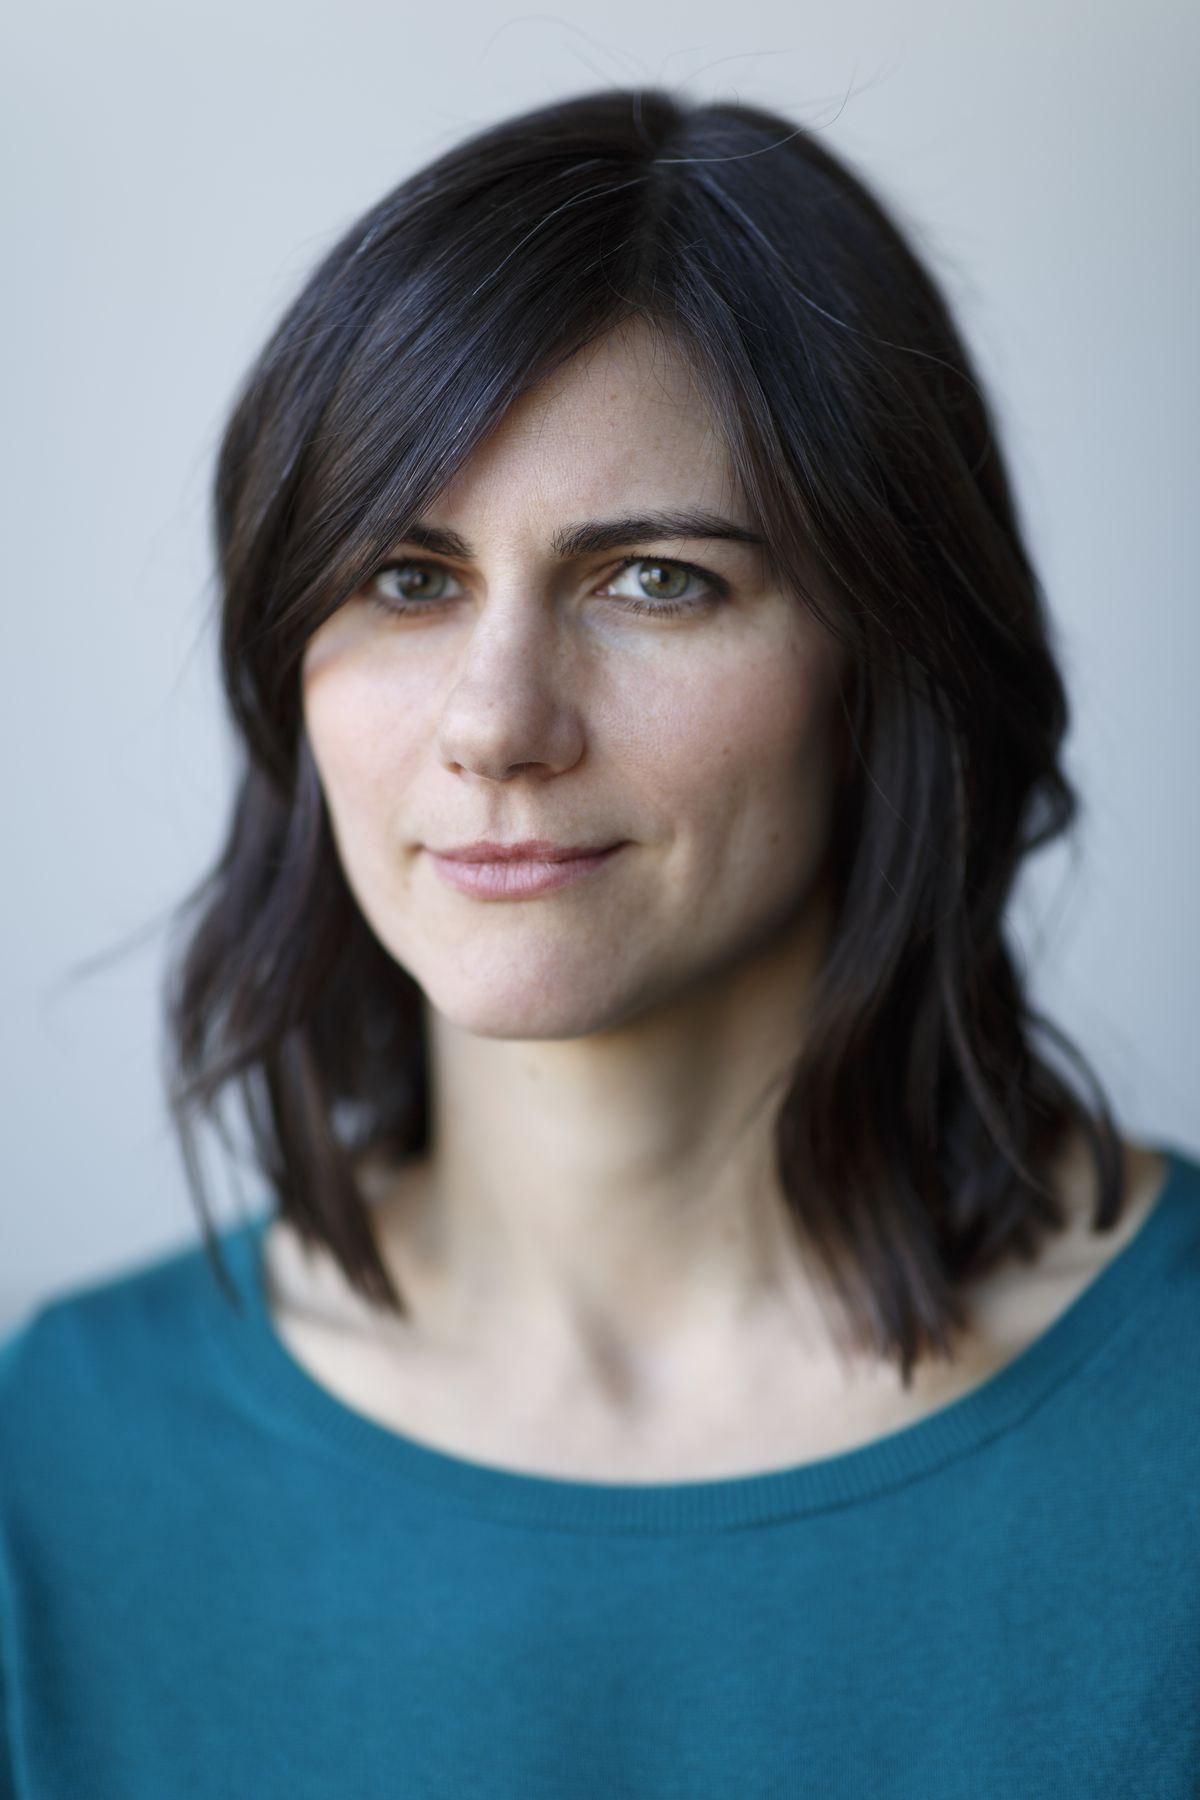 Sarah Kessler